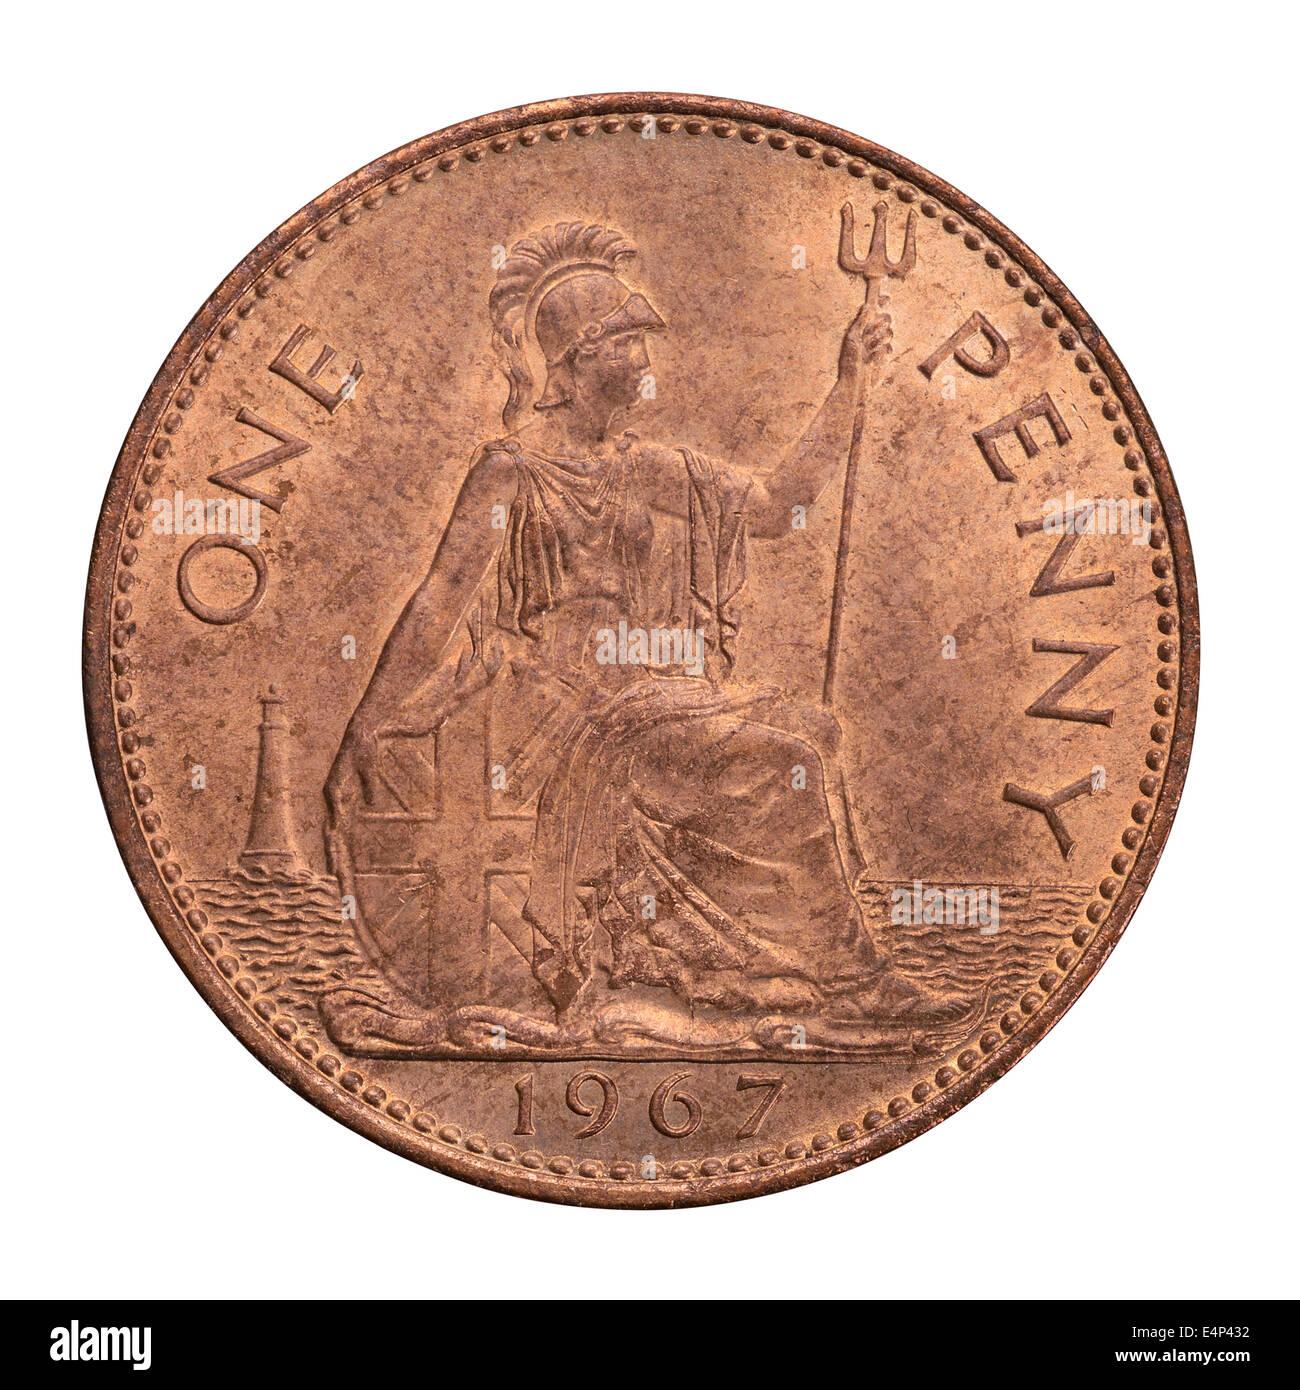 1967 britische One Penny Münze Stockbild